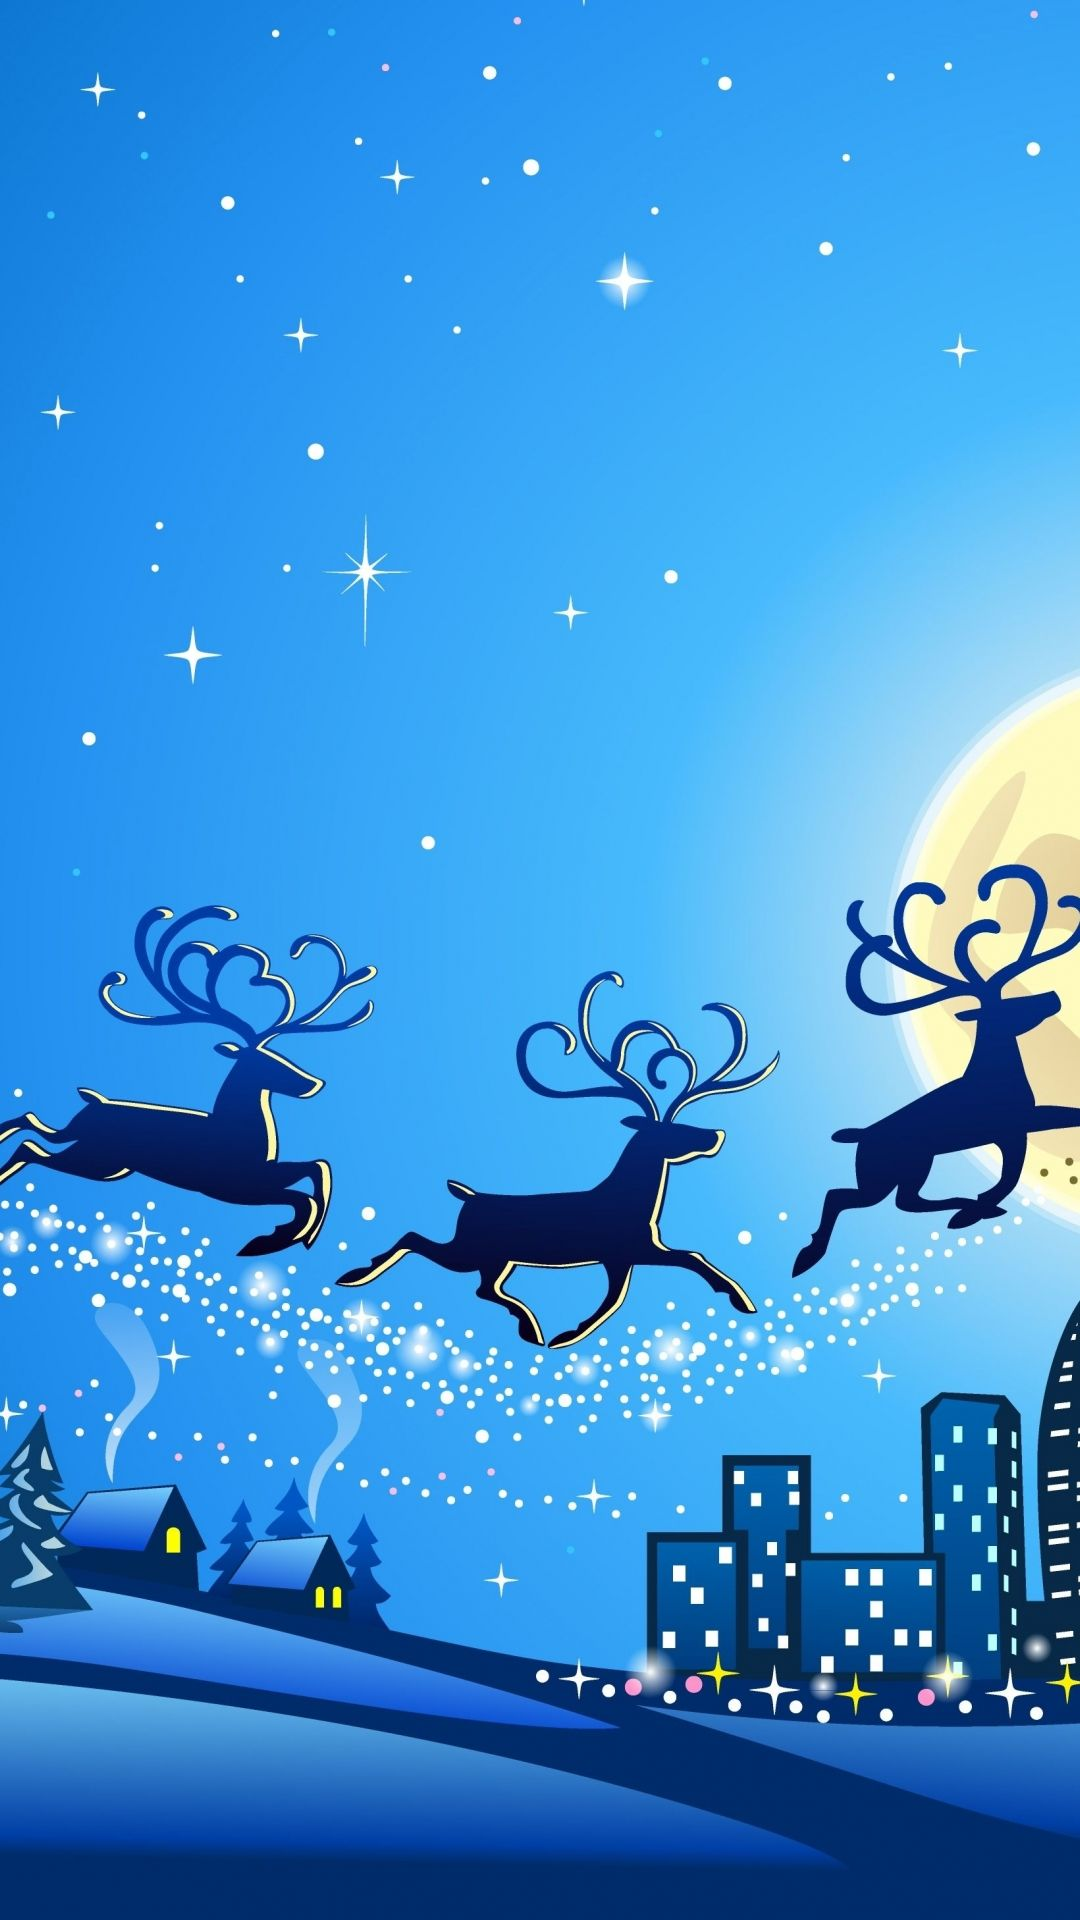 Santa Banta Wallpaper Iphone Christmas Christmas Wallpaper Hd Christmas Wallpaper